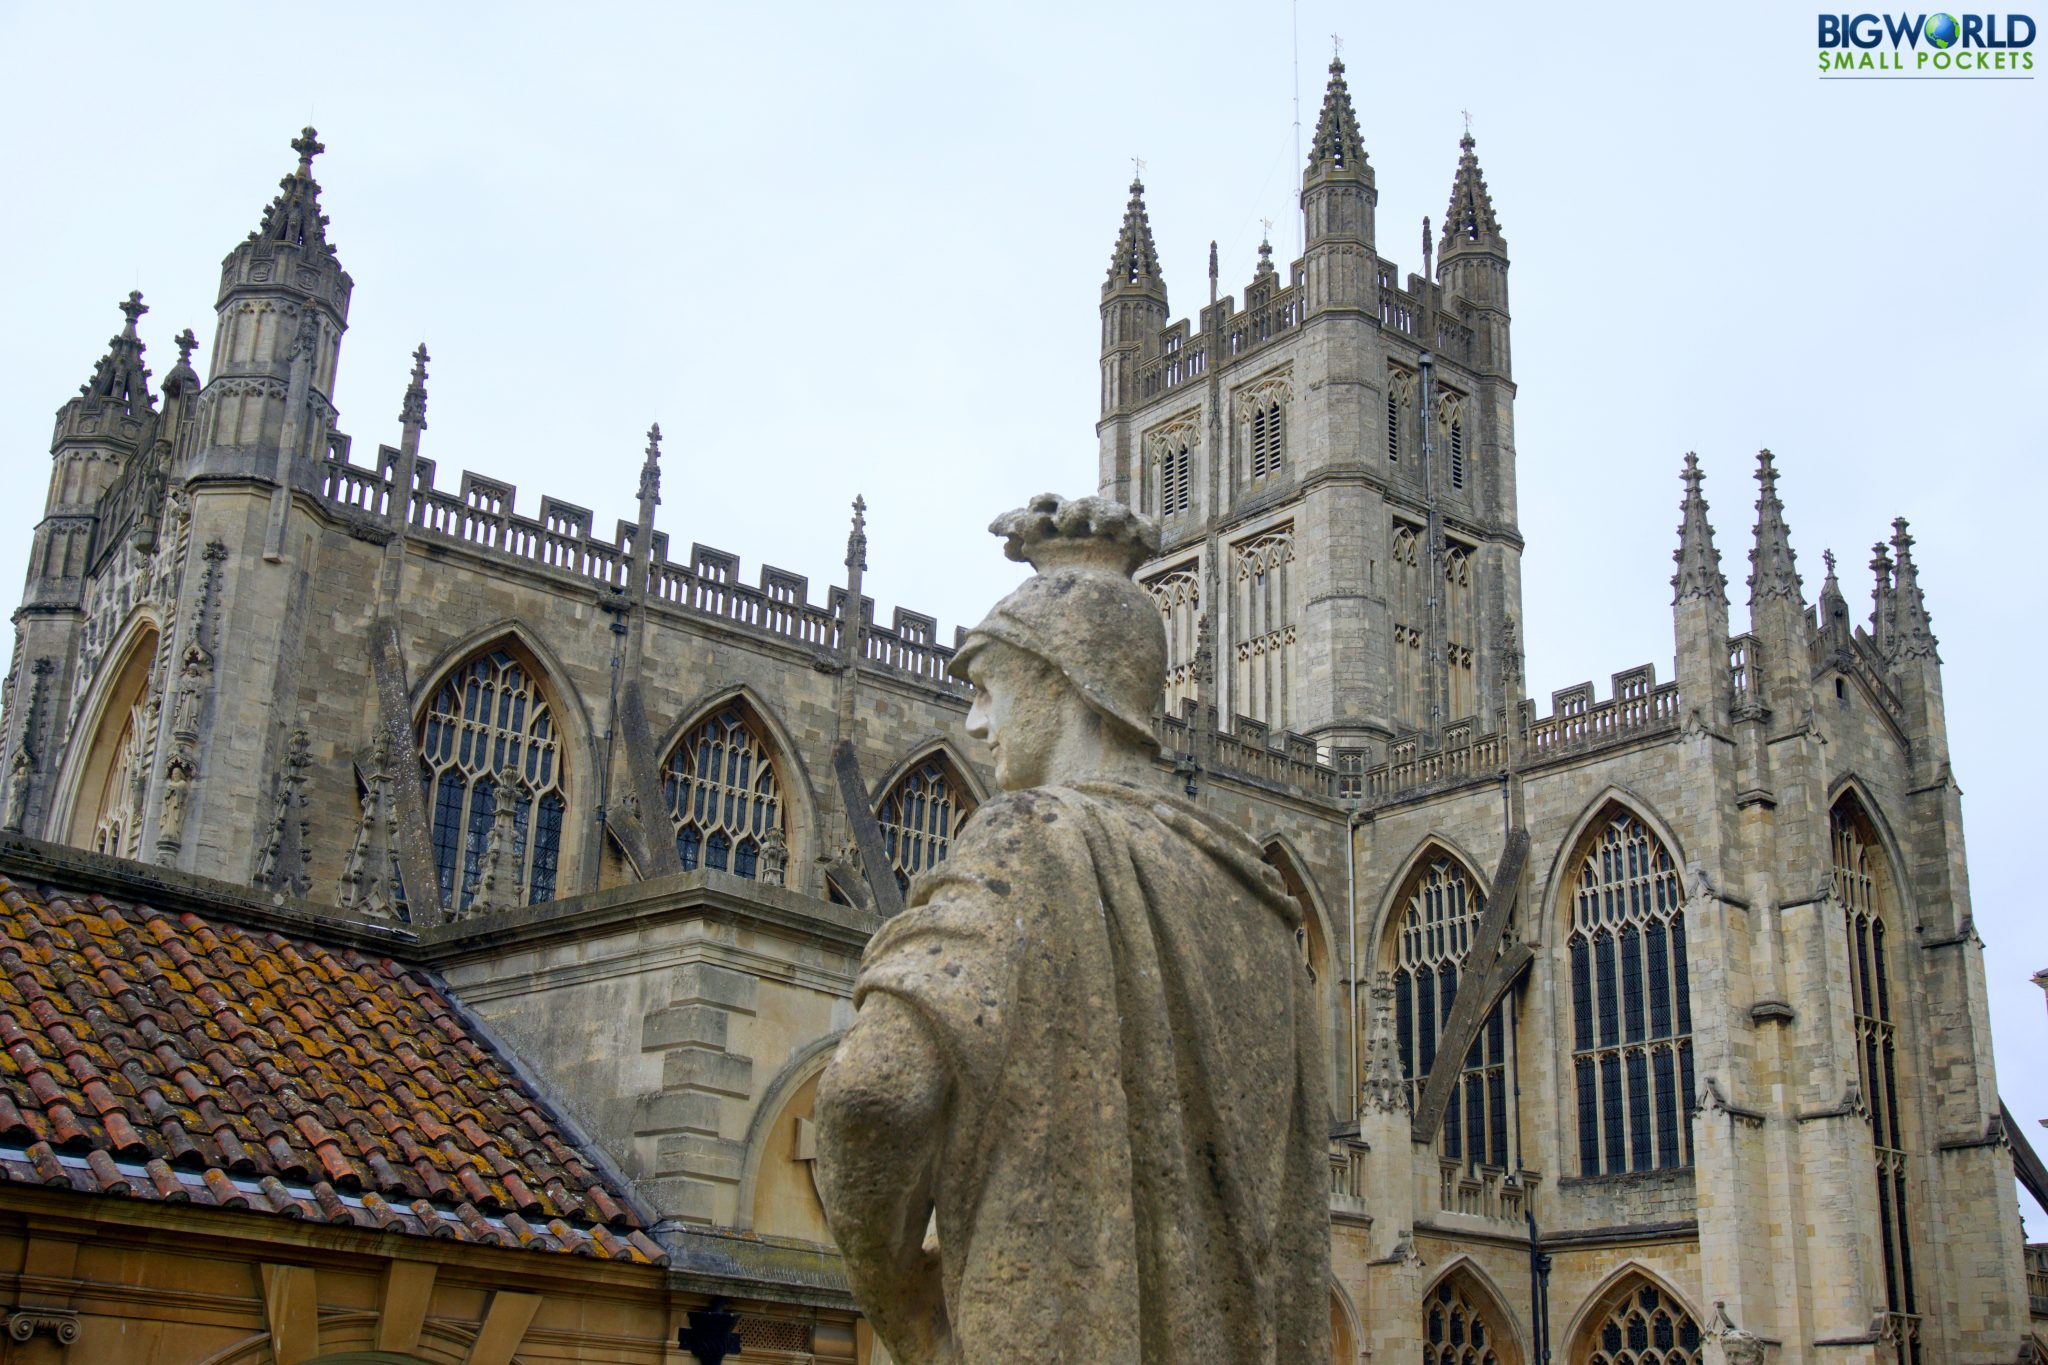 UK, Somerset, Bath Abbey